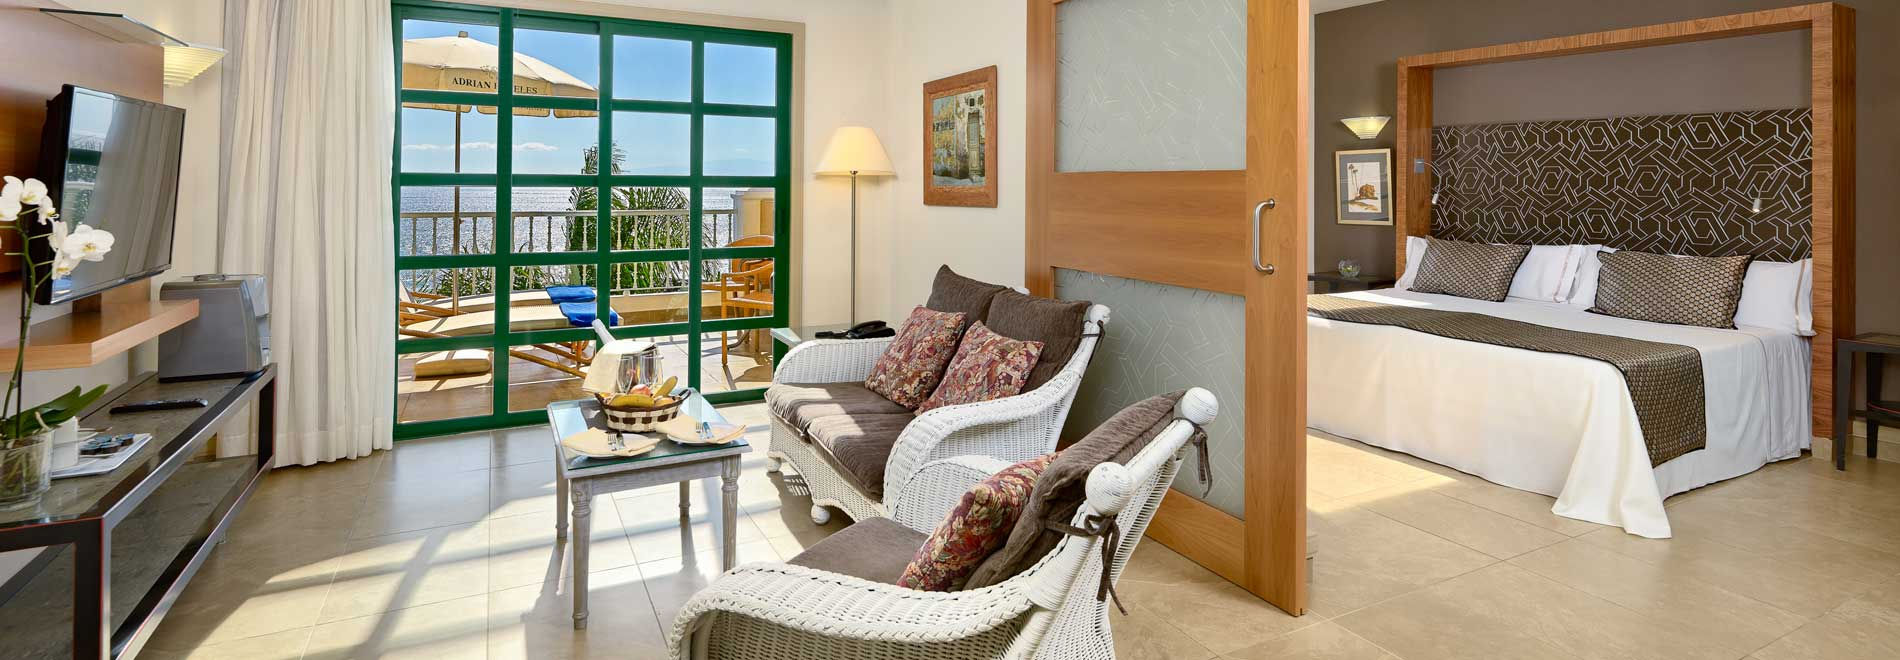 Habitaciones Hotel Jardines De Nivaria Tenerife Costa Adeje